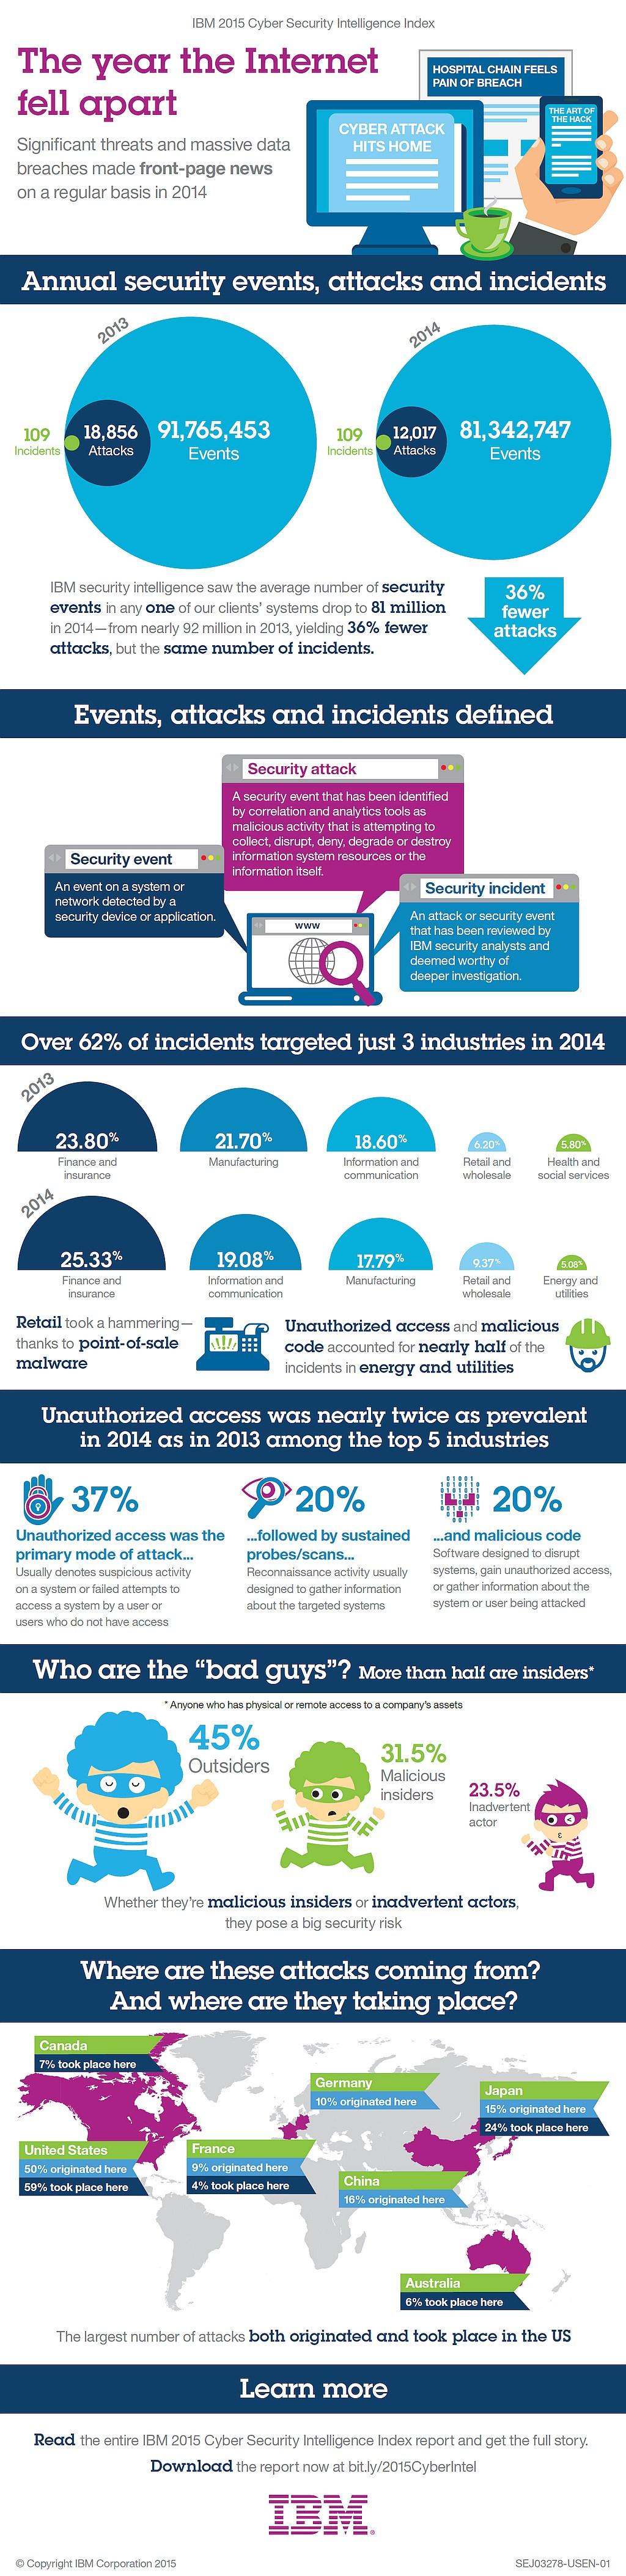 infografik ibm cyber security index